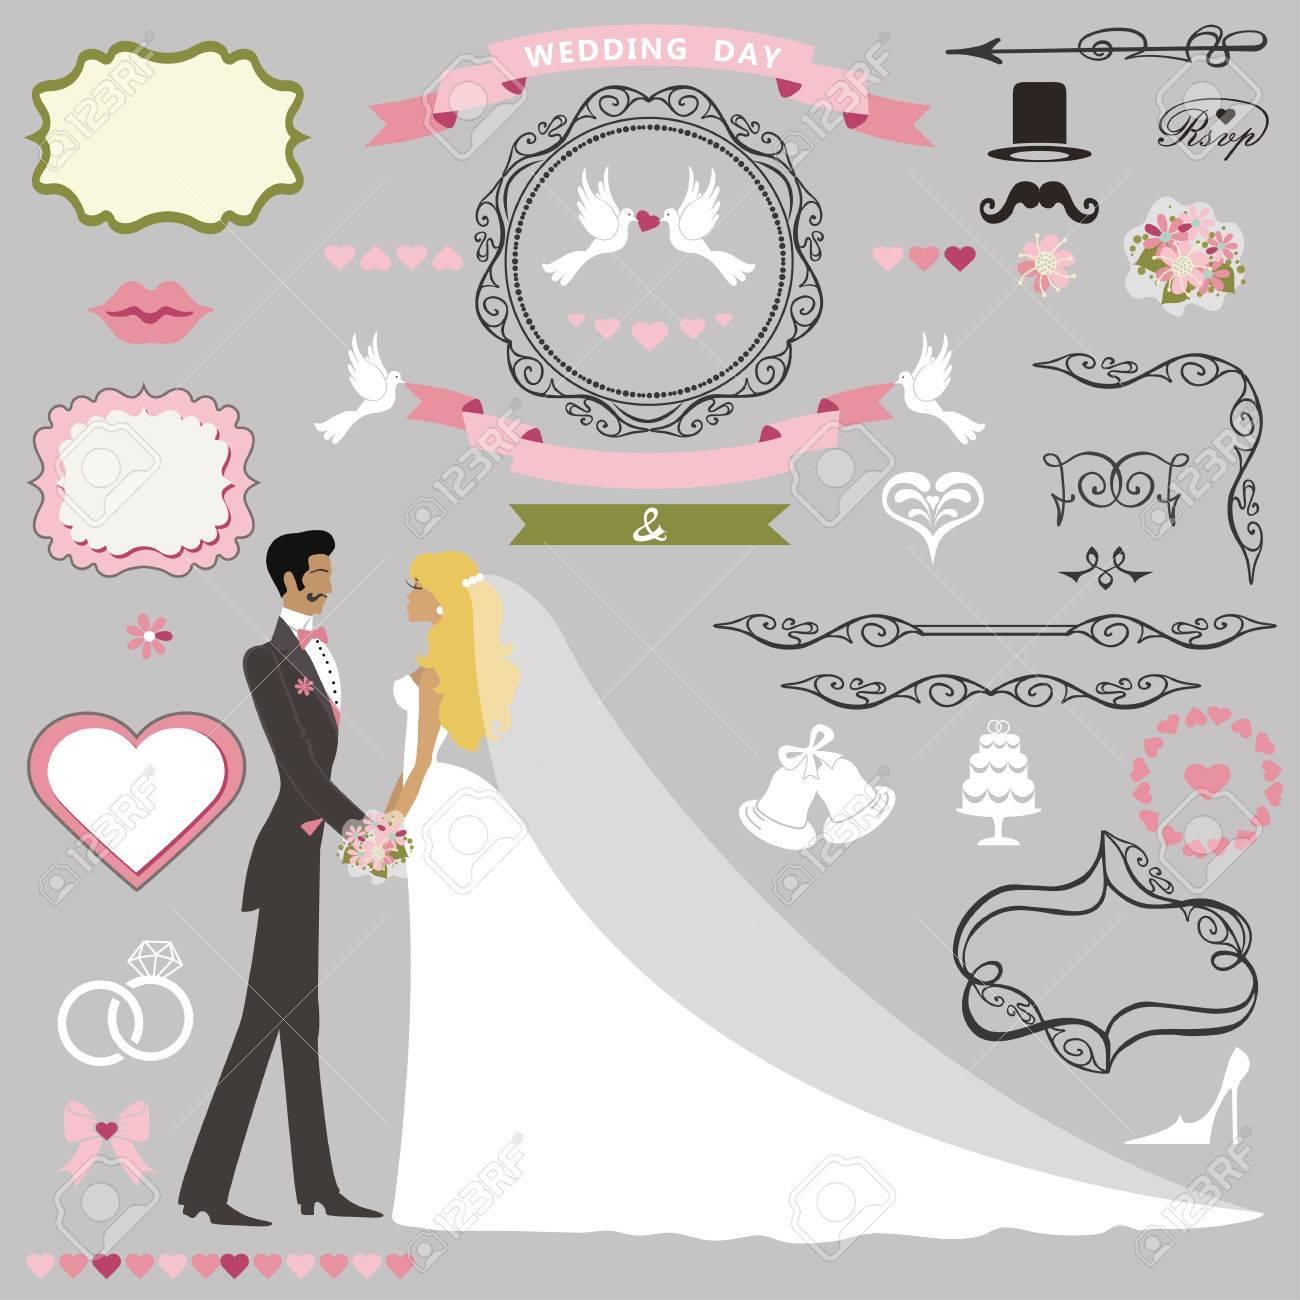 Wedding Invitation Card Decor SetCartoon Couple Bride And Groom